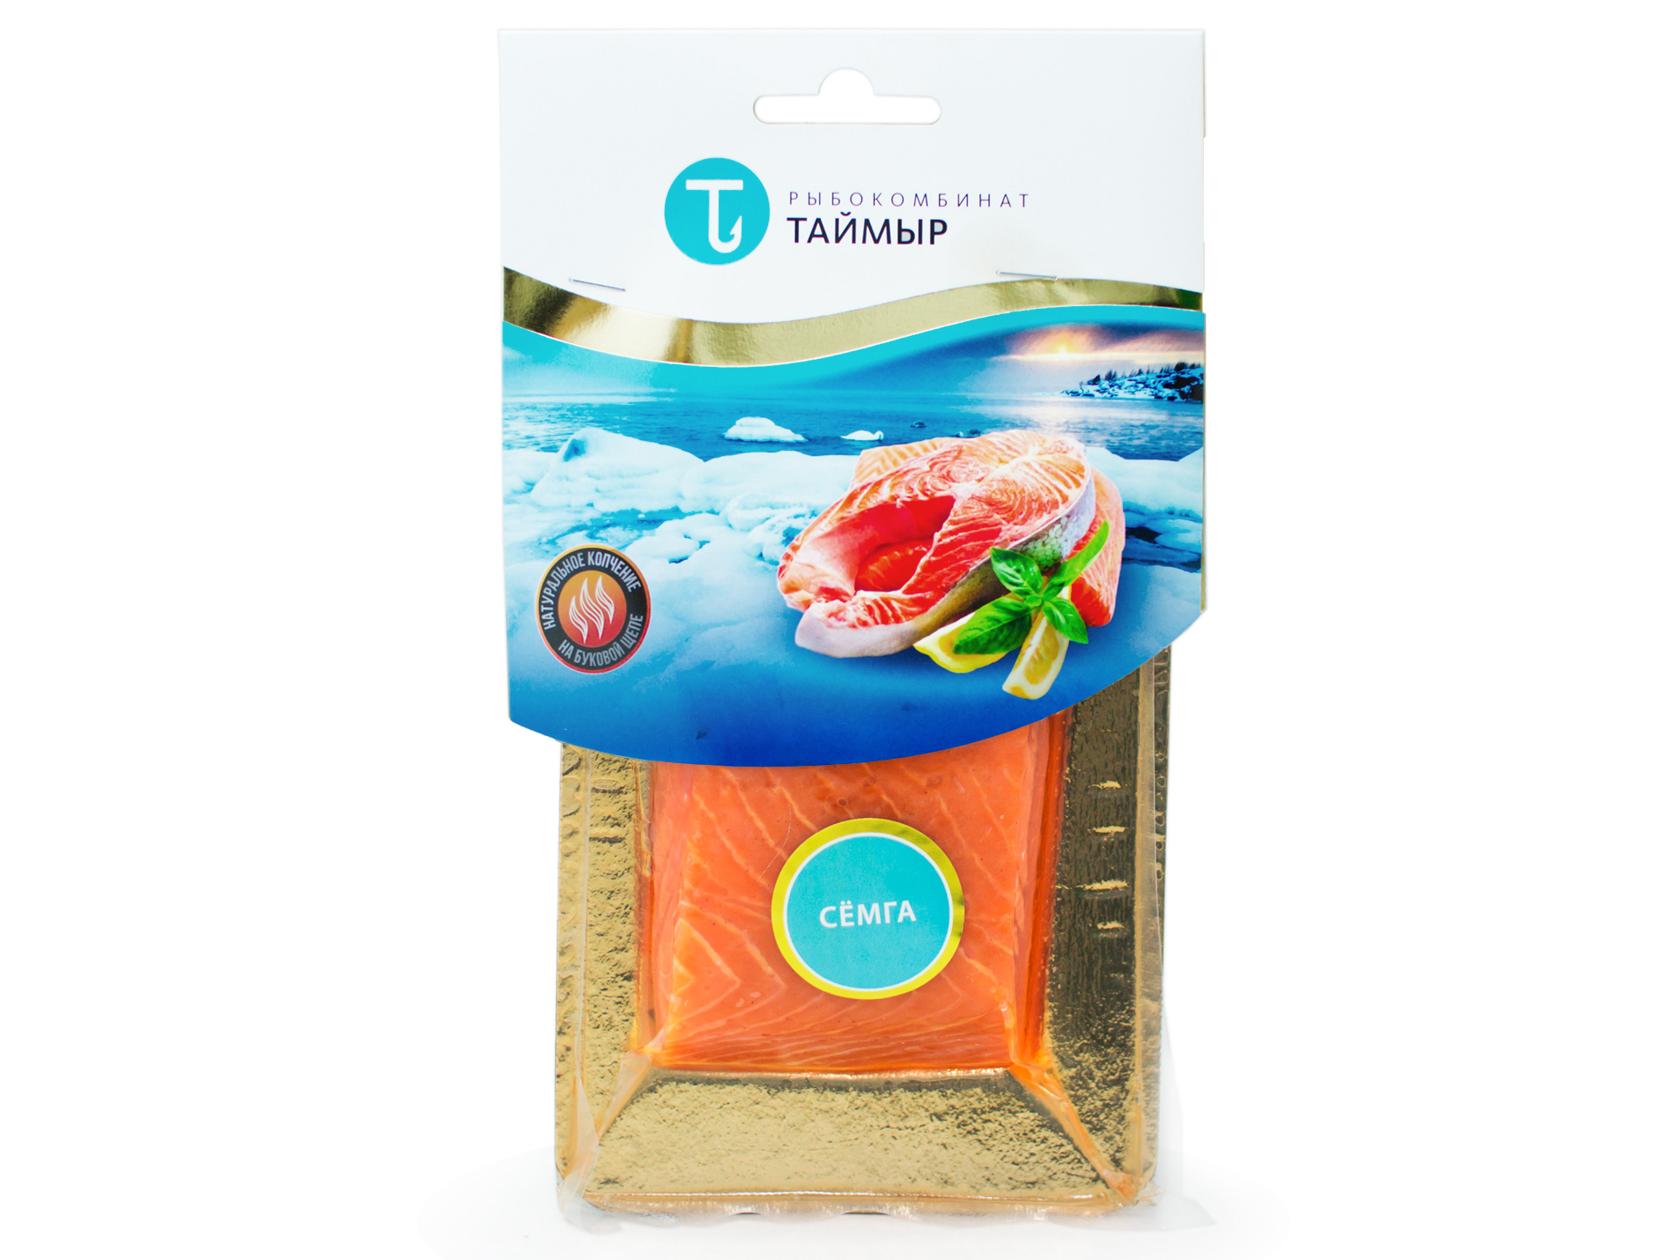 Рыбокомбинат Таймыр